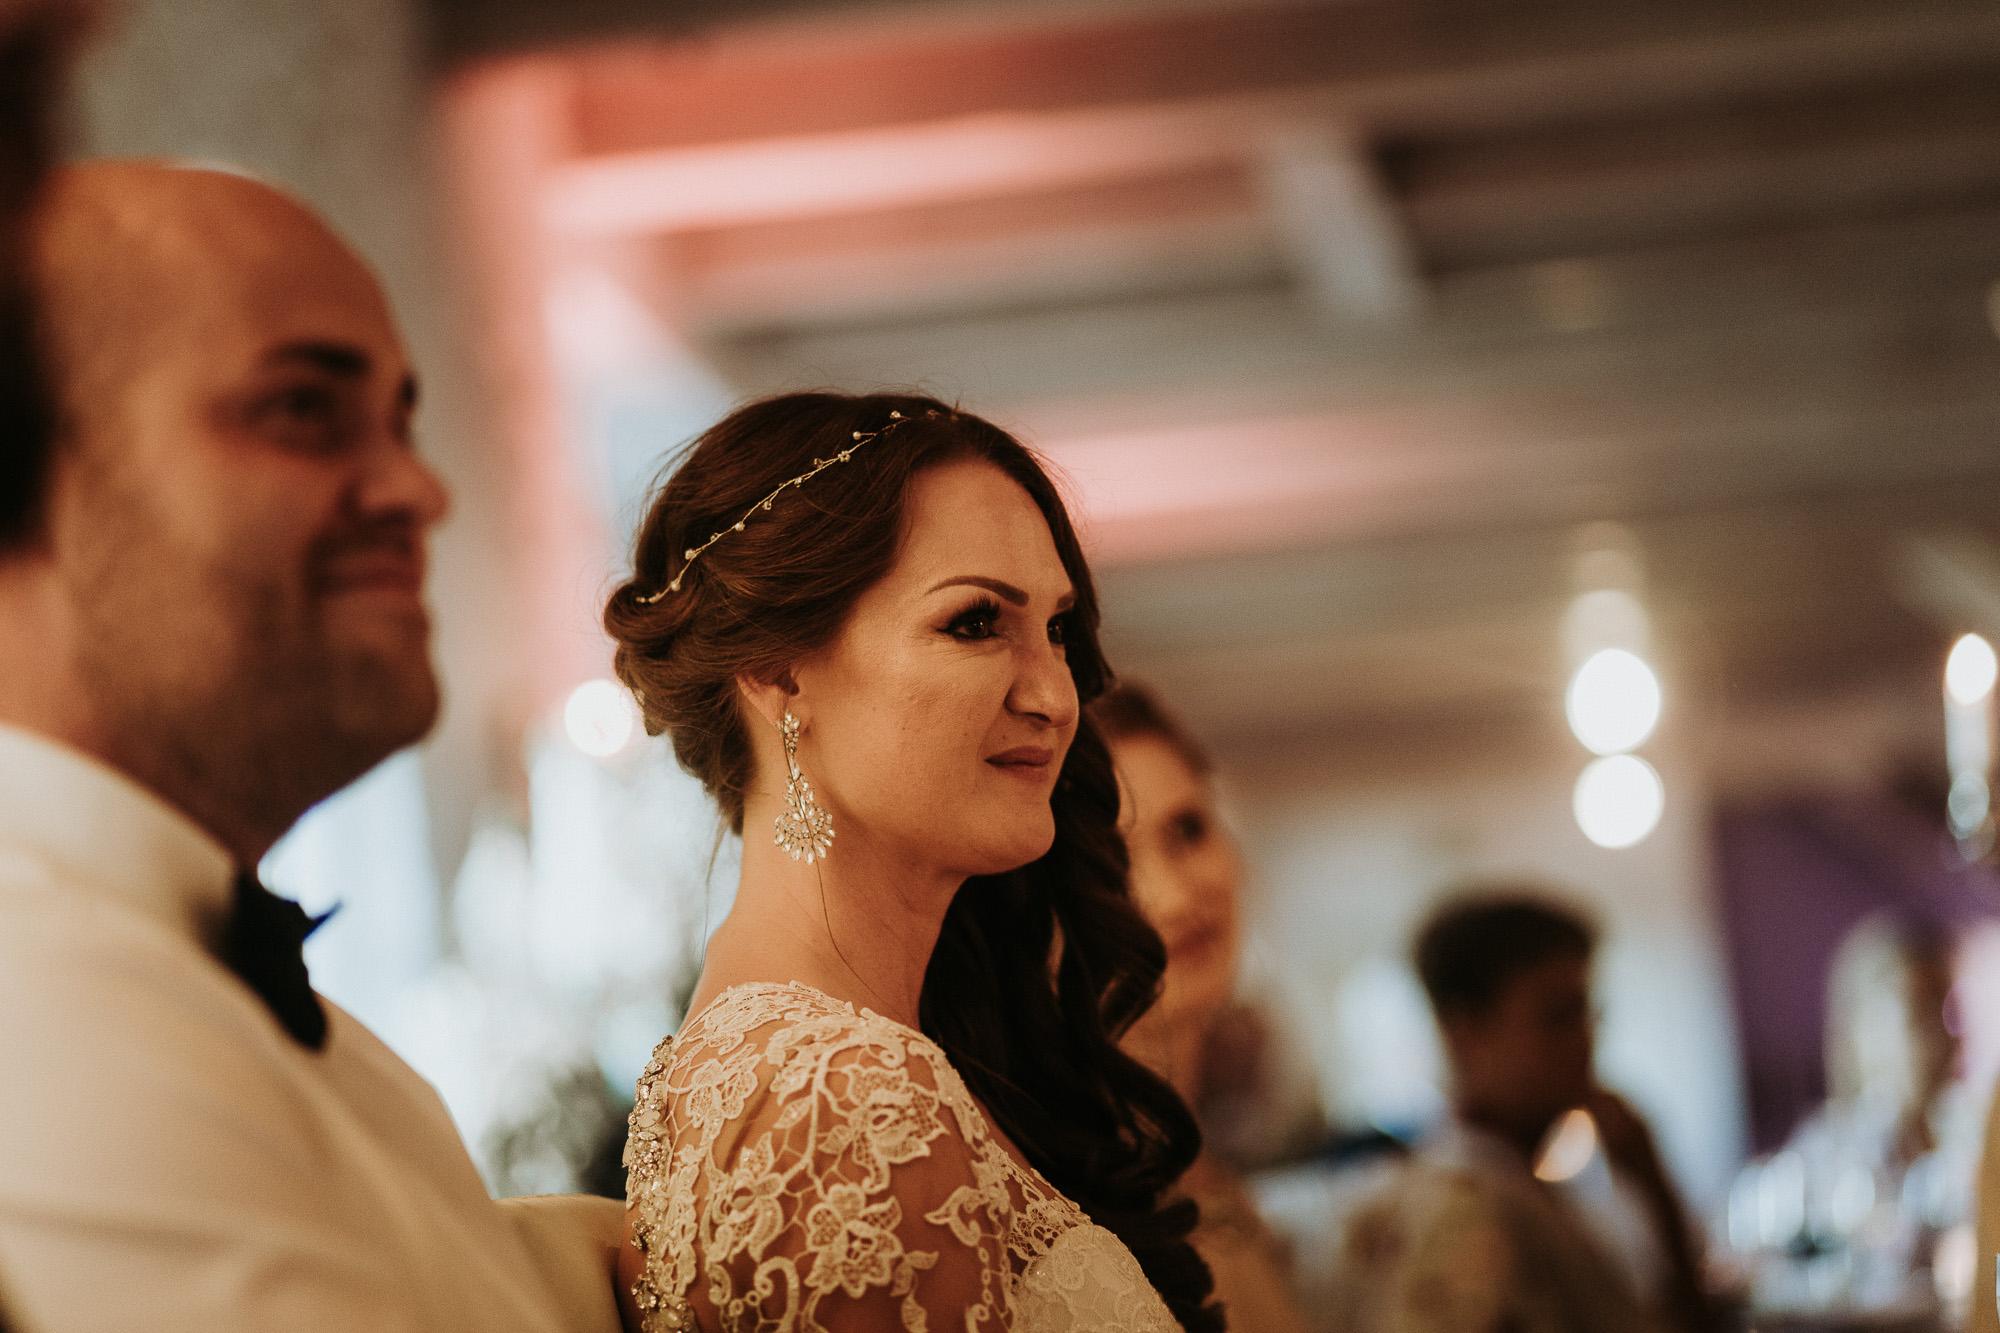 DanielaMarquardtPhotography_Hochzeitsfotograf_Düsseldorf_Köln_Mallorca_Bayern_Austria_Harz_Wedding_AileenundLennart_Weddingphotographer_Ibiza_Tuskany_Italien_Toskana_Portugal_Lissabon231